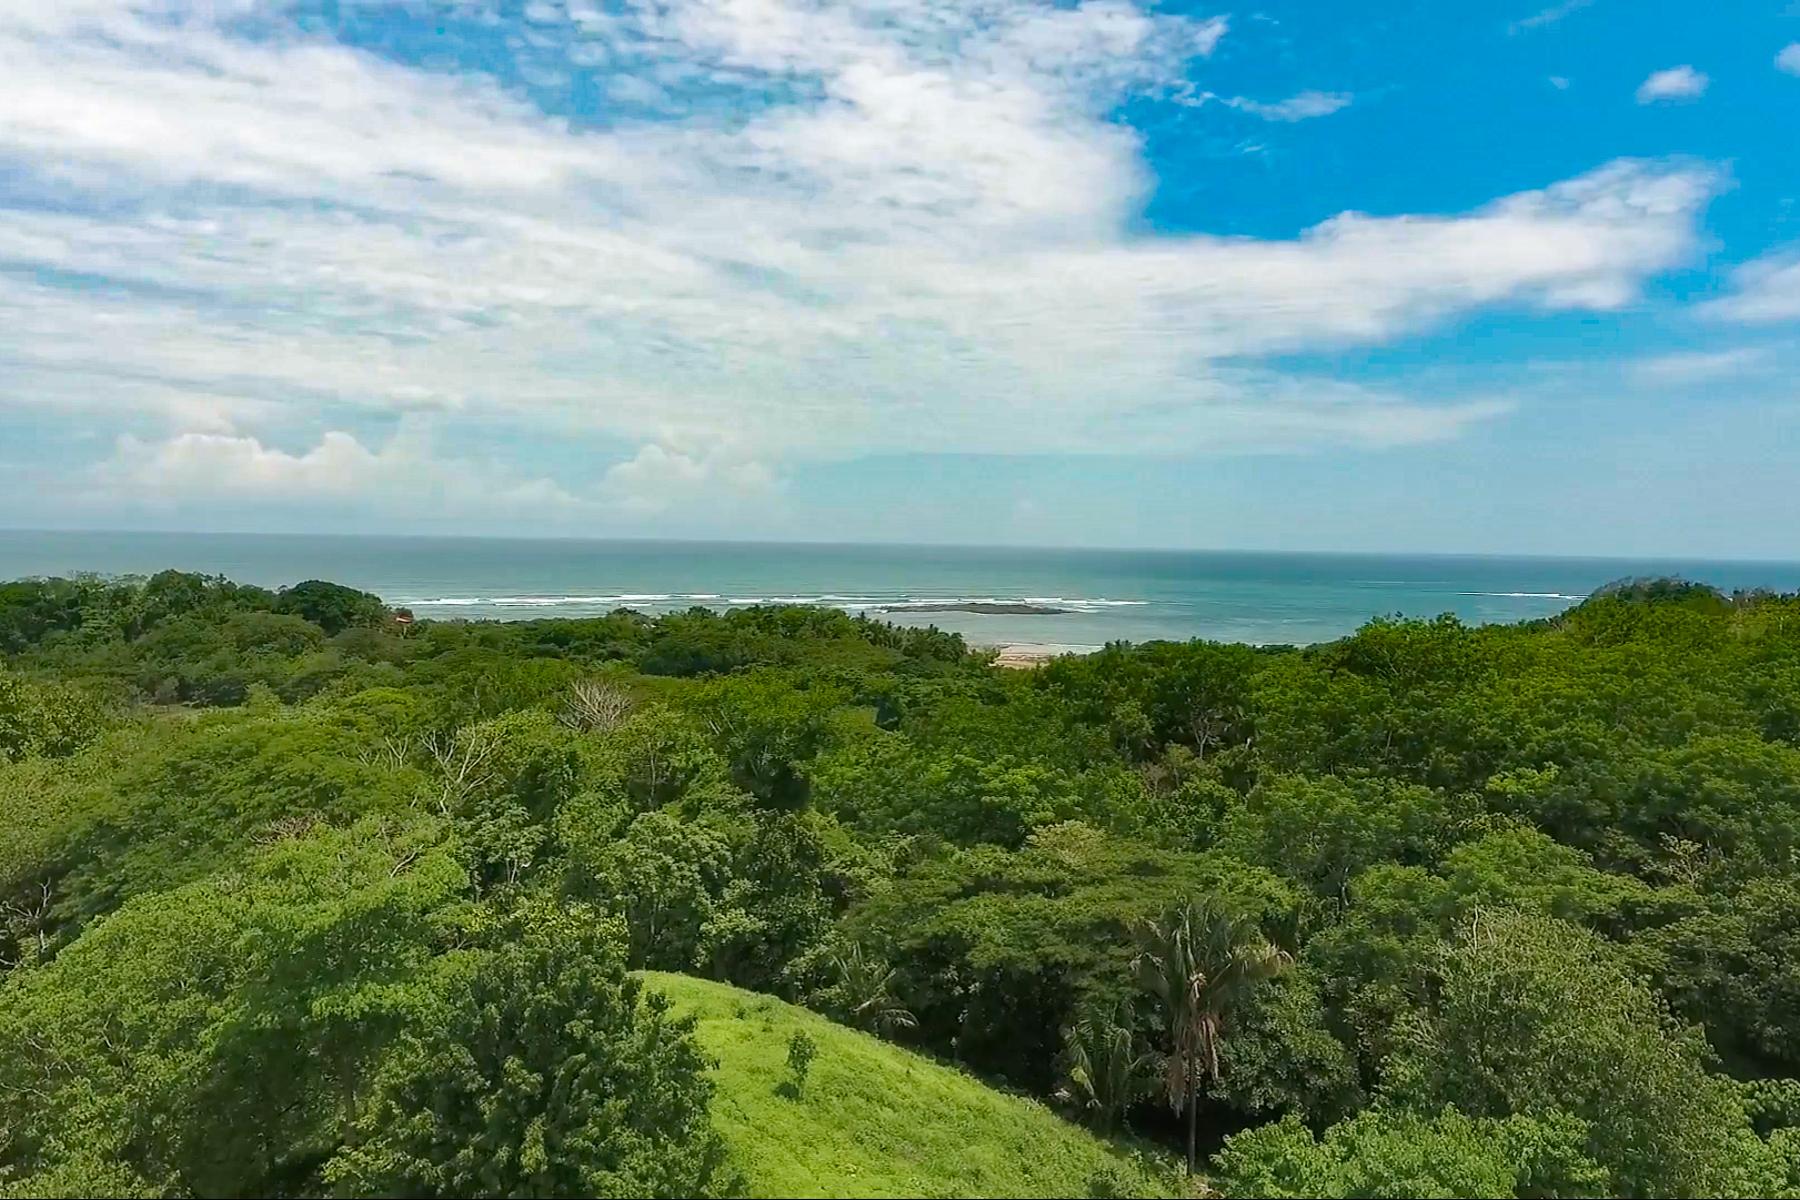 Terreno por un Venta en Developer´s Ocean View Dream Site Other Puntarenas, Puntarenas Costa Rica